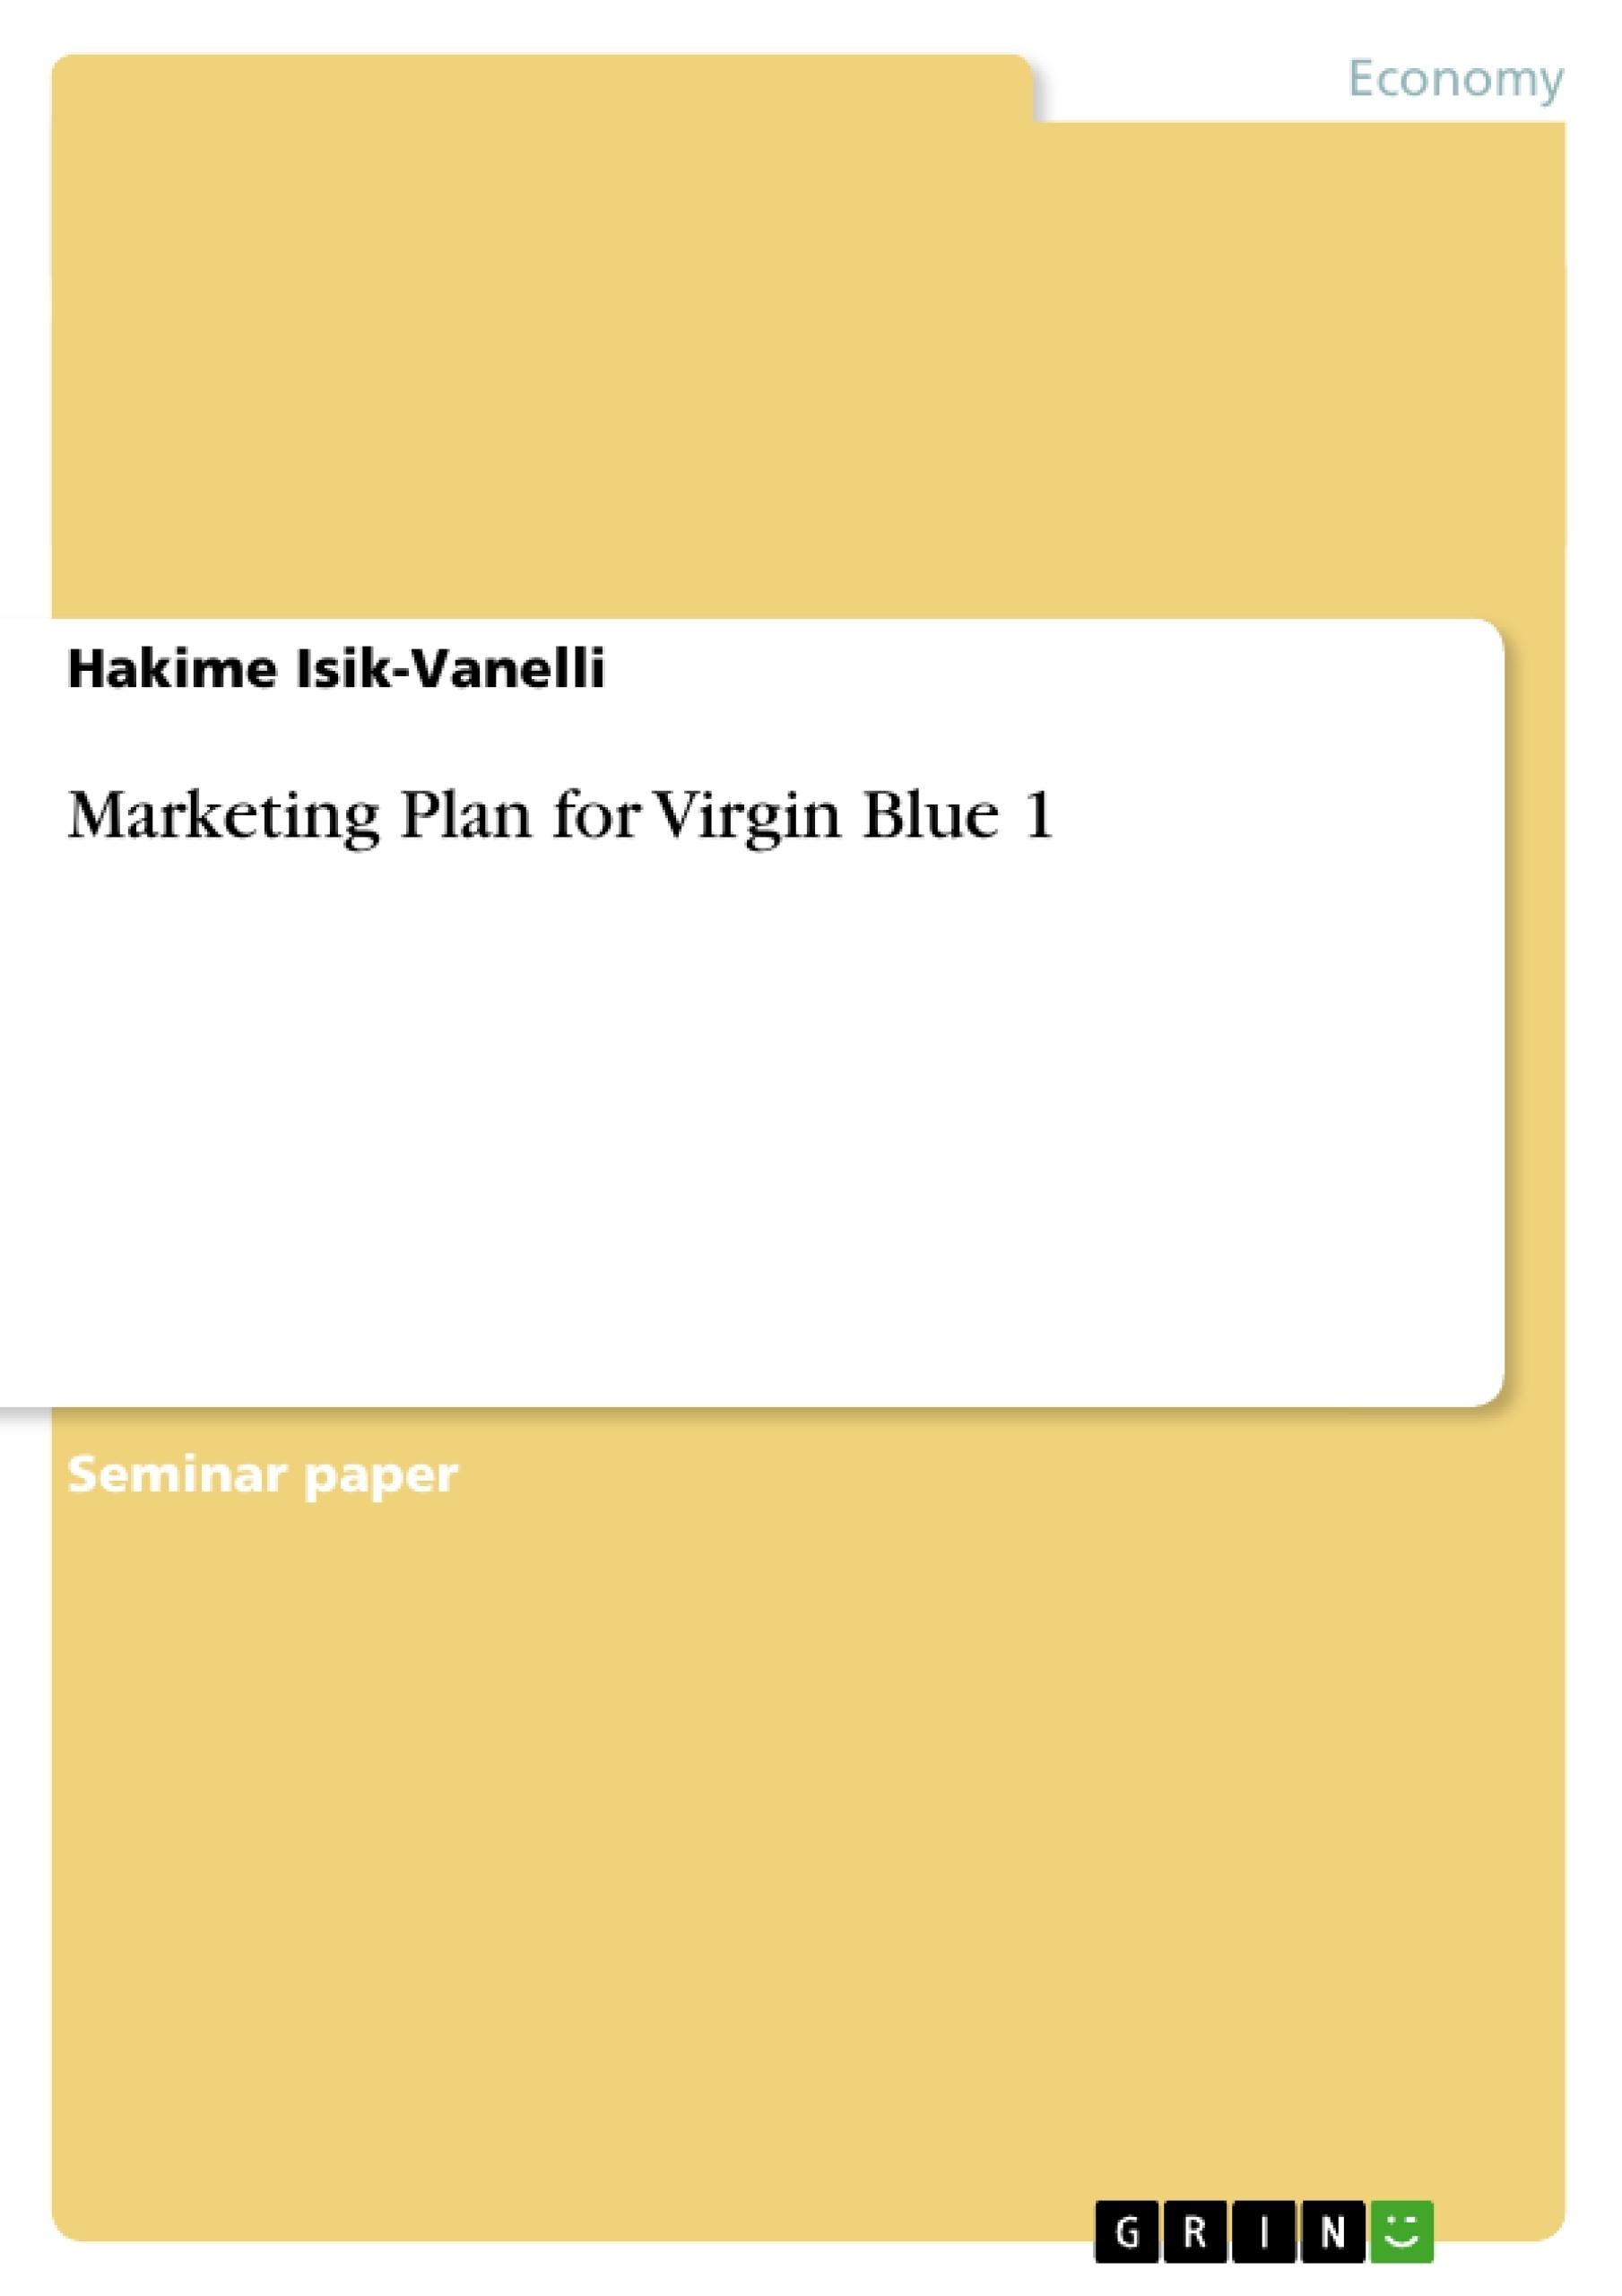 Title: Marketing Plan for Virgin Blue 1